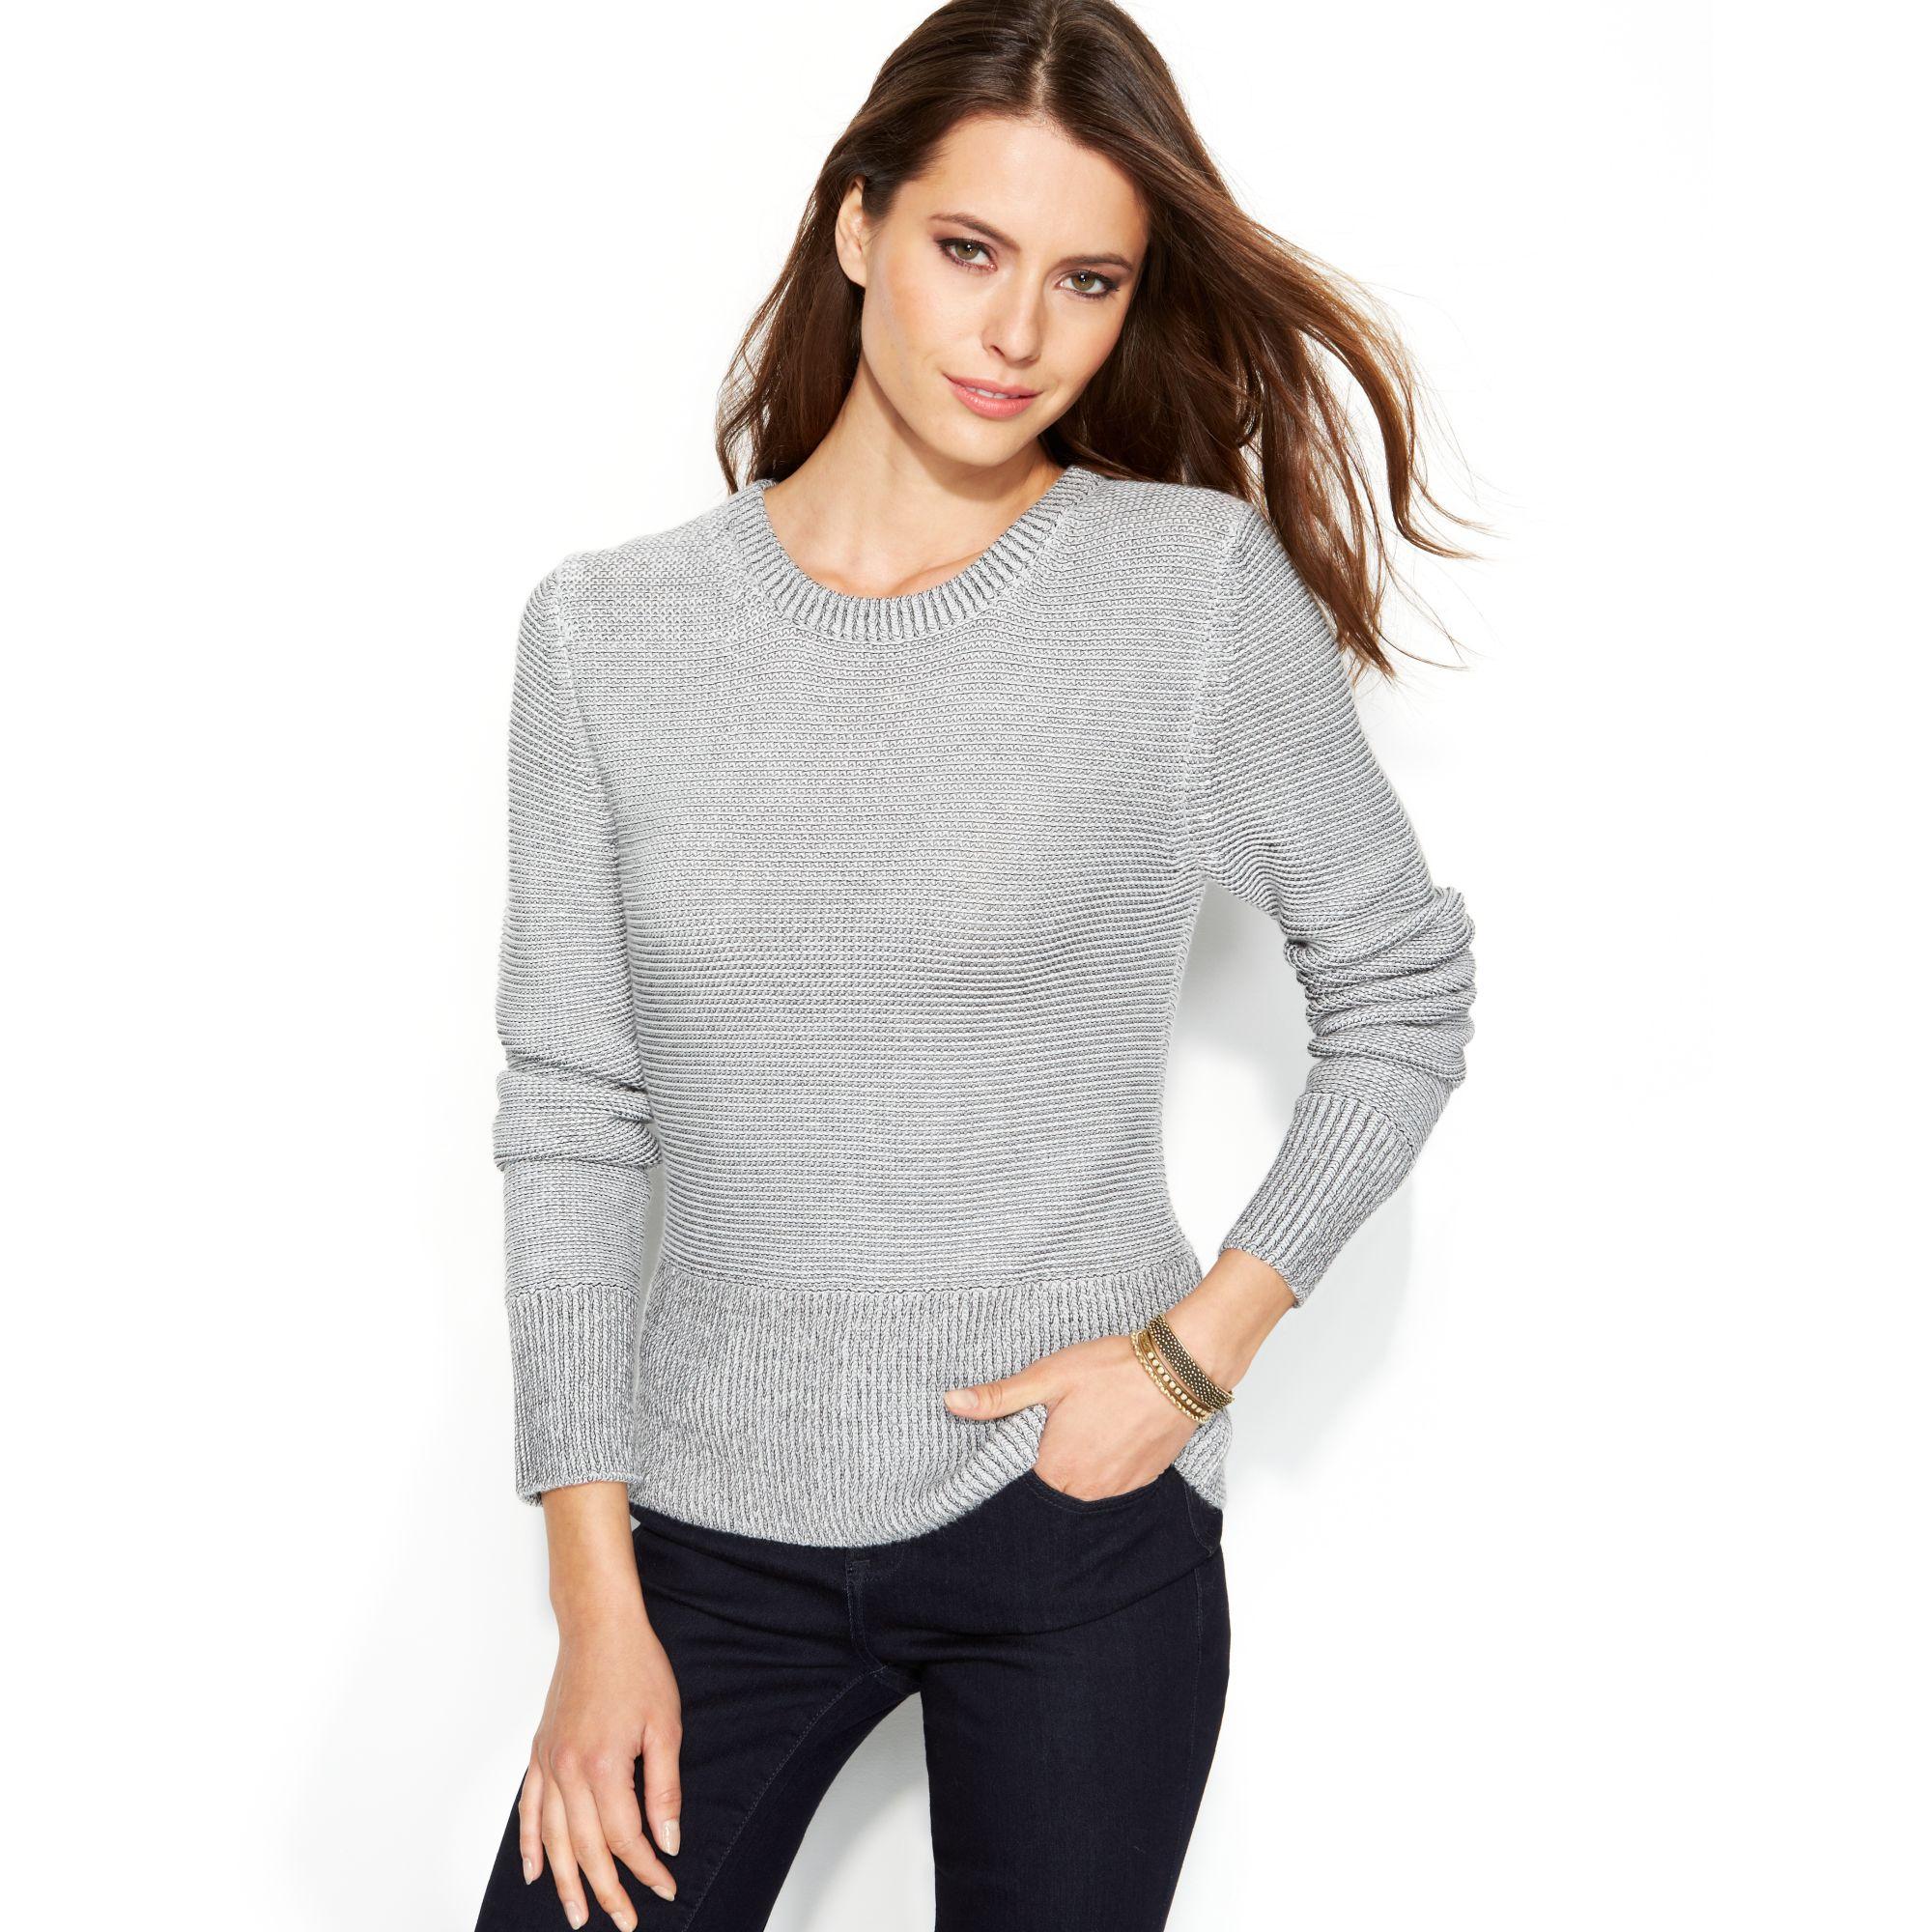 calvin klein jeans longsleeve textured crewneck sweater in. Black Bedroom Furniture Sets. Home Design Ideas